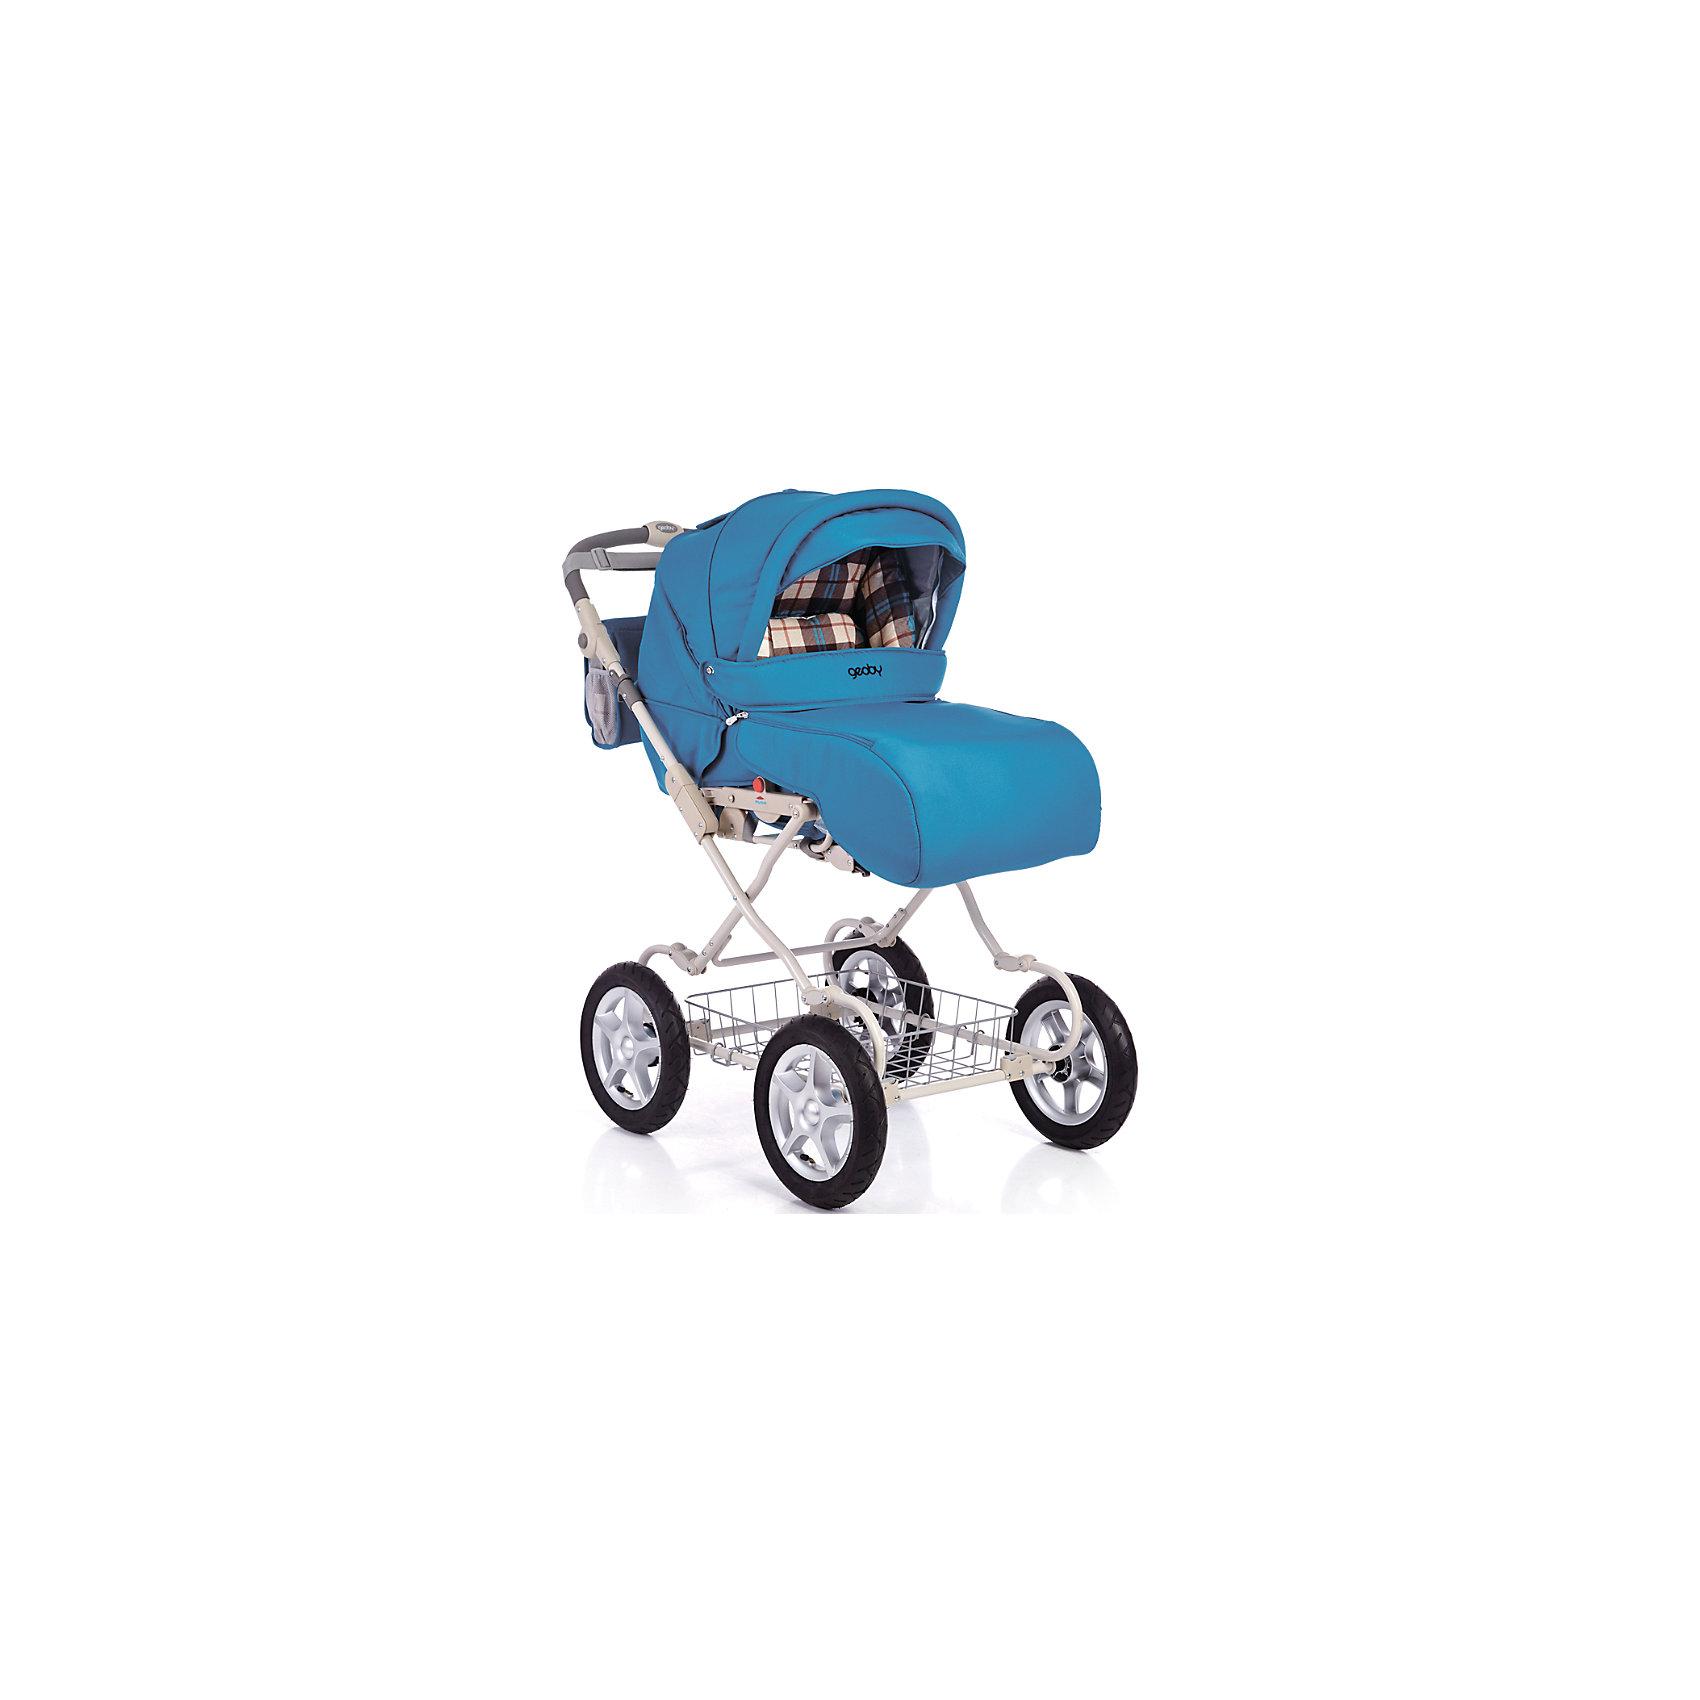 Geoby Коляска-трансформер 05C601H (RHLL), Geoby, синий б у коляску геоби катарина на авито